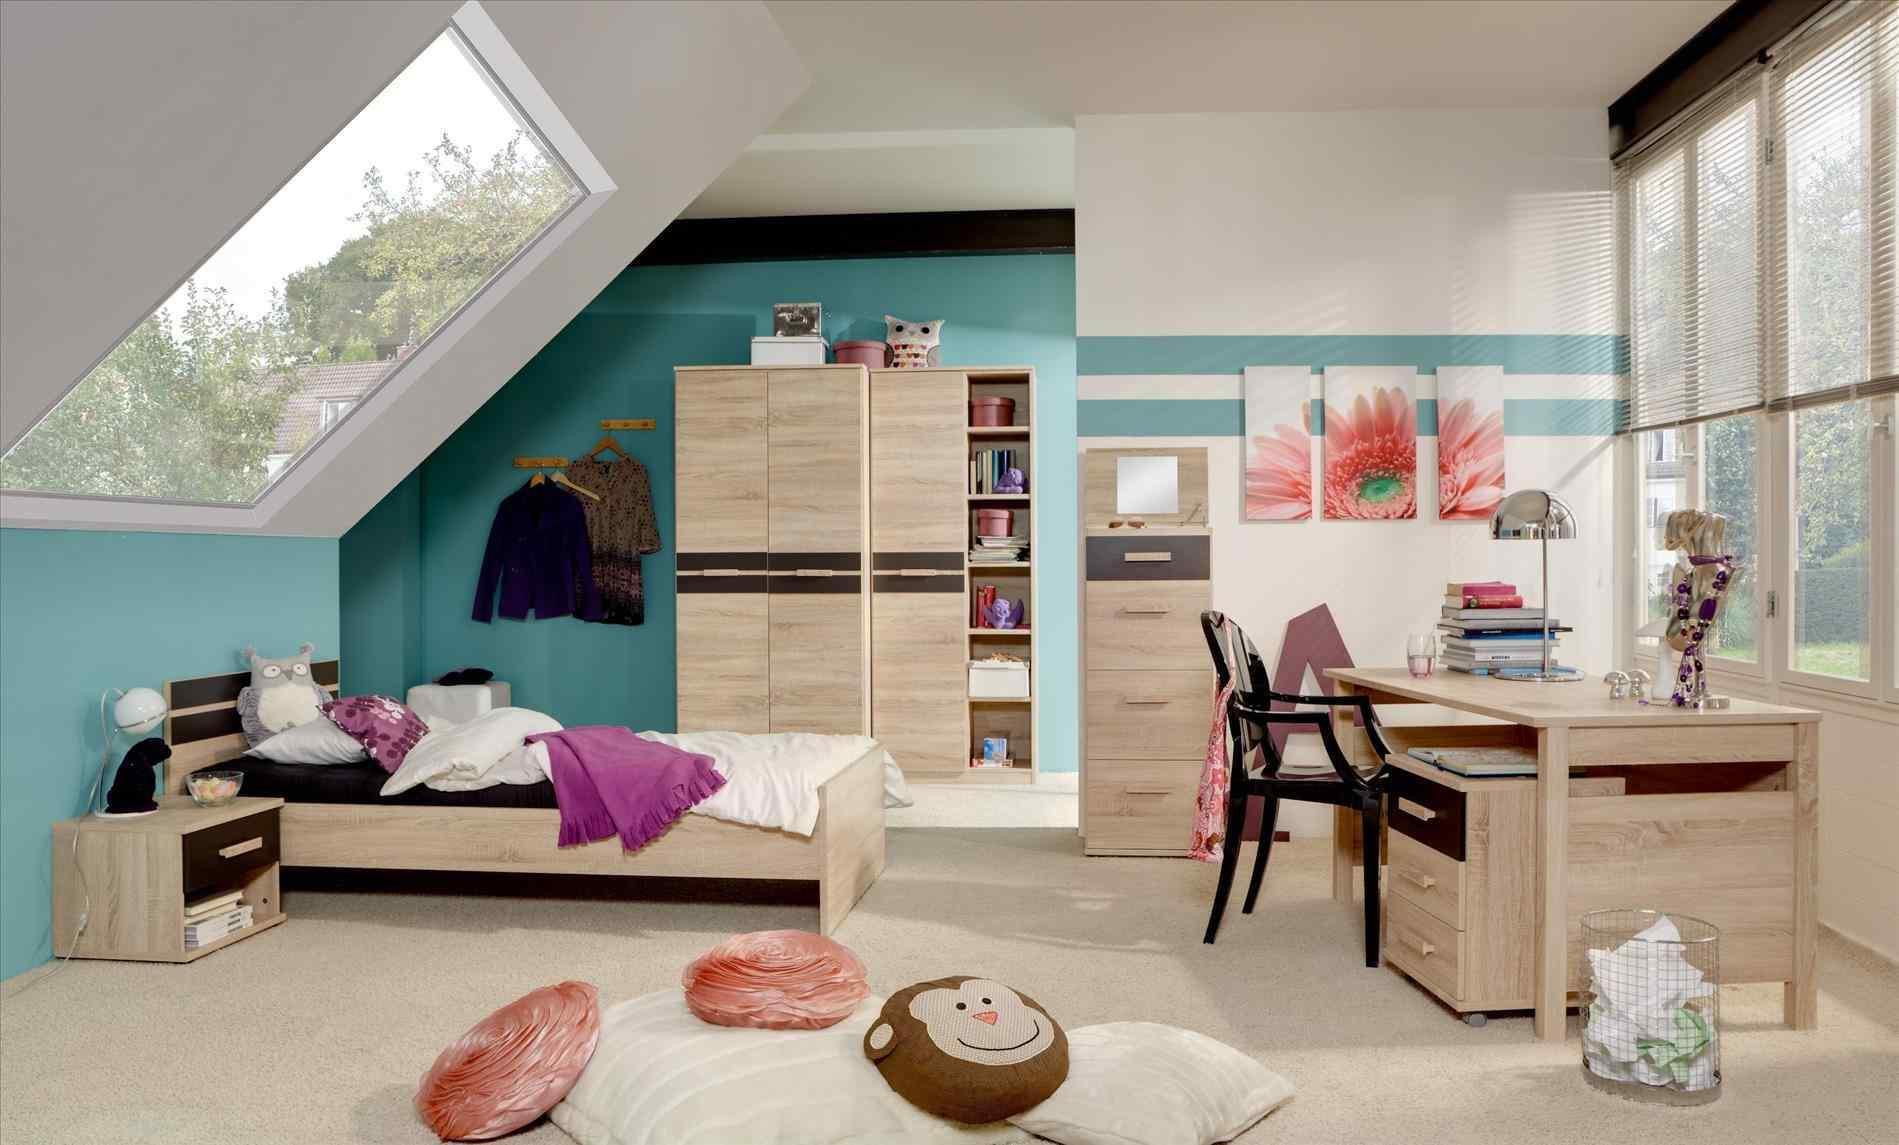 Coole Ausmalbilder Fur Teenager Frisch Coole Betten Für Teenager Stock